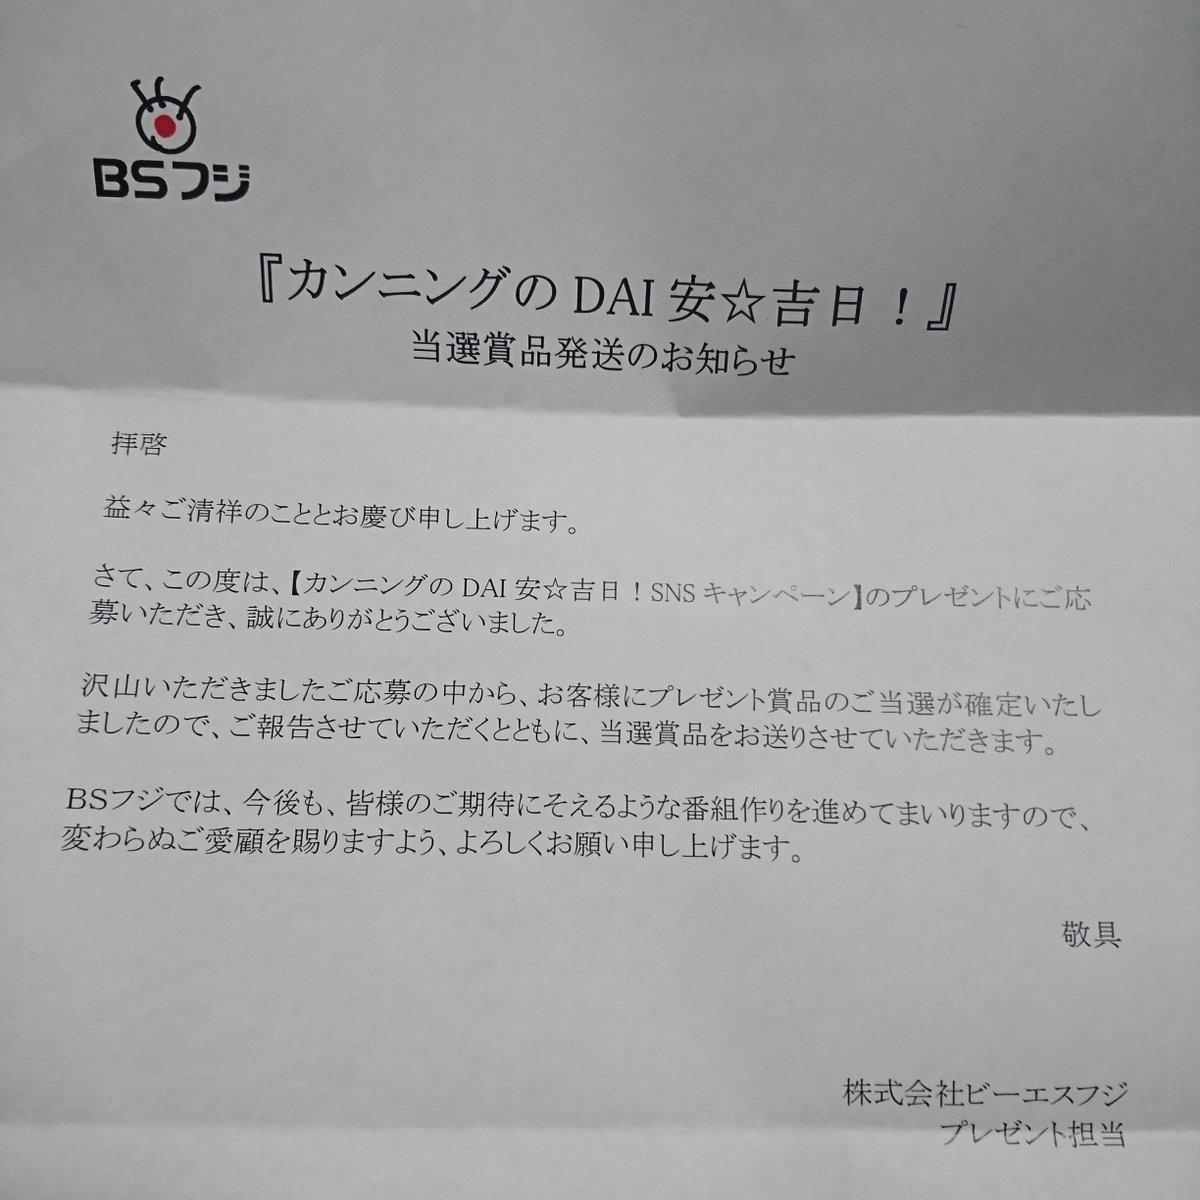 Images of カンニングのDAI安吉日! - JapaneseClass.jp